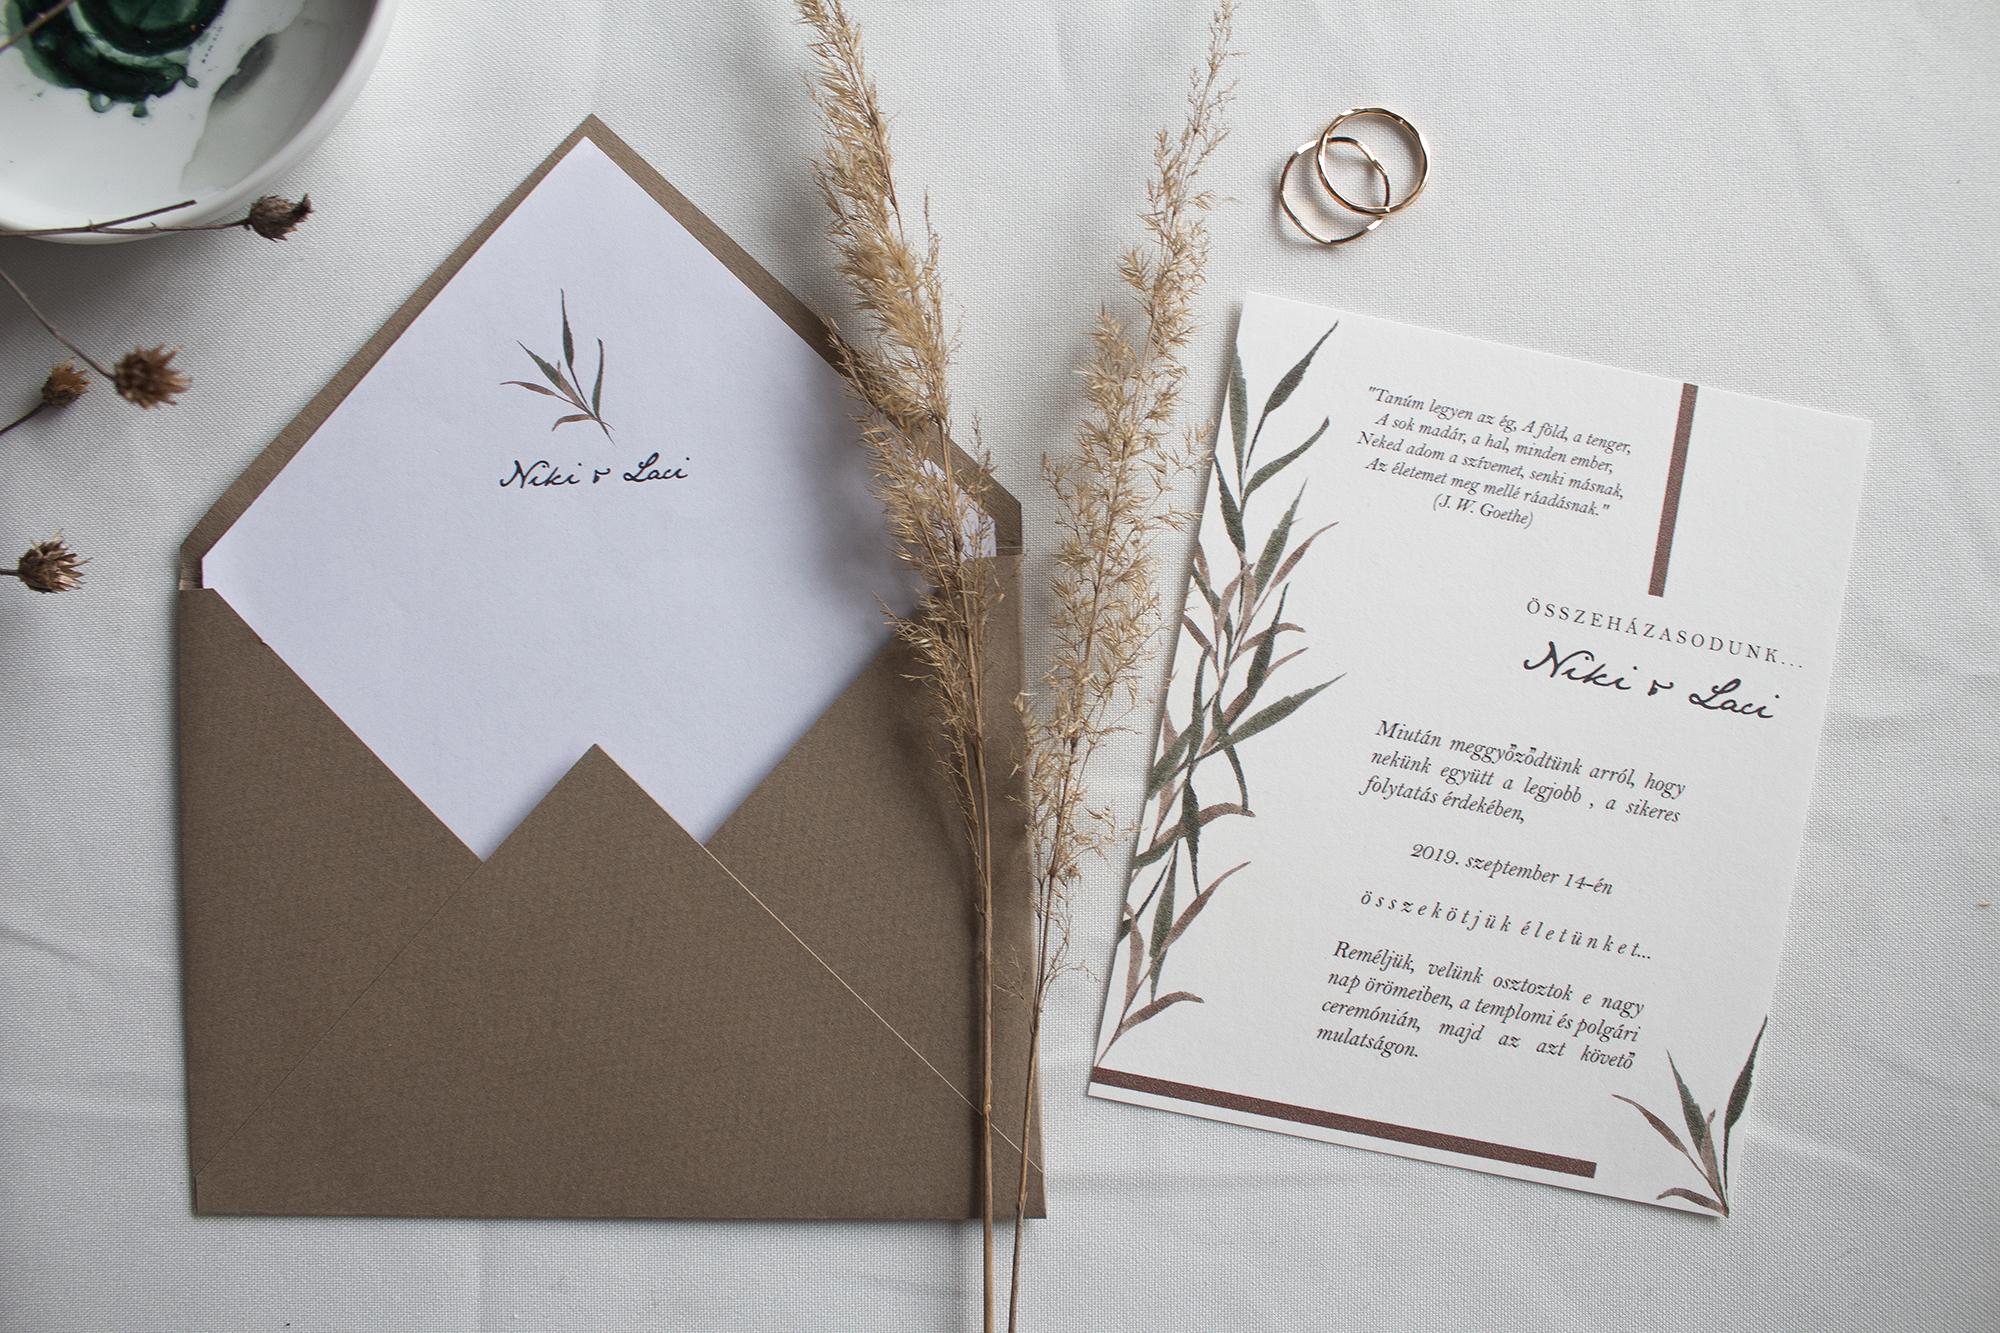 Nádas esküvői meghívó